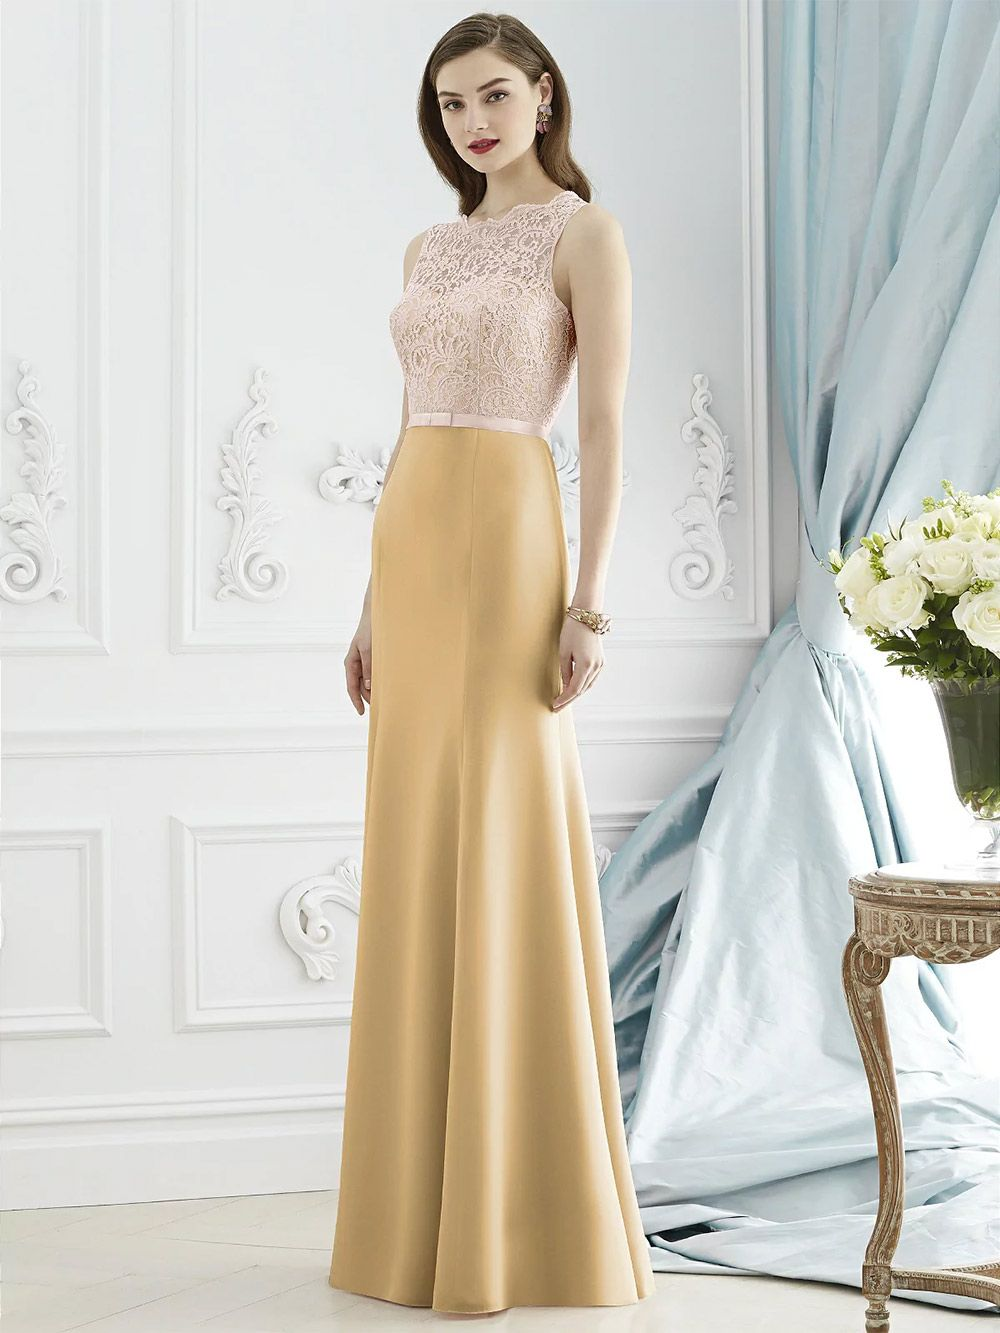 Gold dresses for wedding  goldbridesmaiddresses  Gold Bridesmaid Dress  Pinterest  Gold